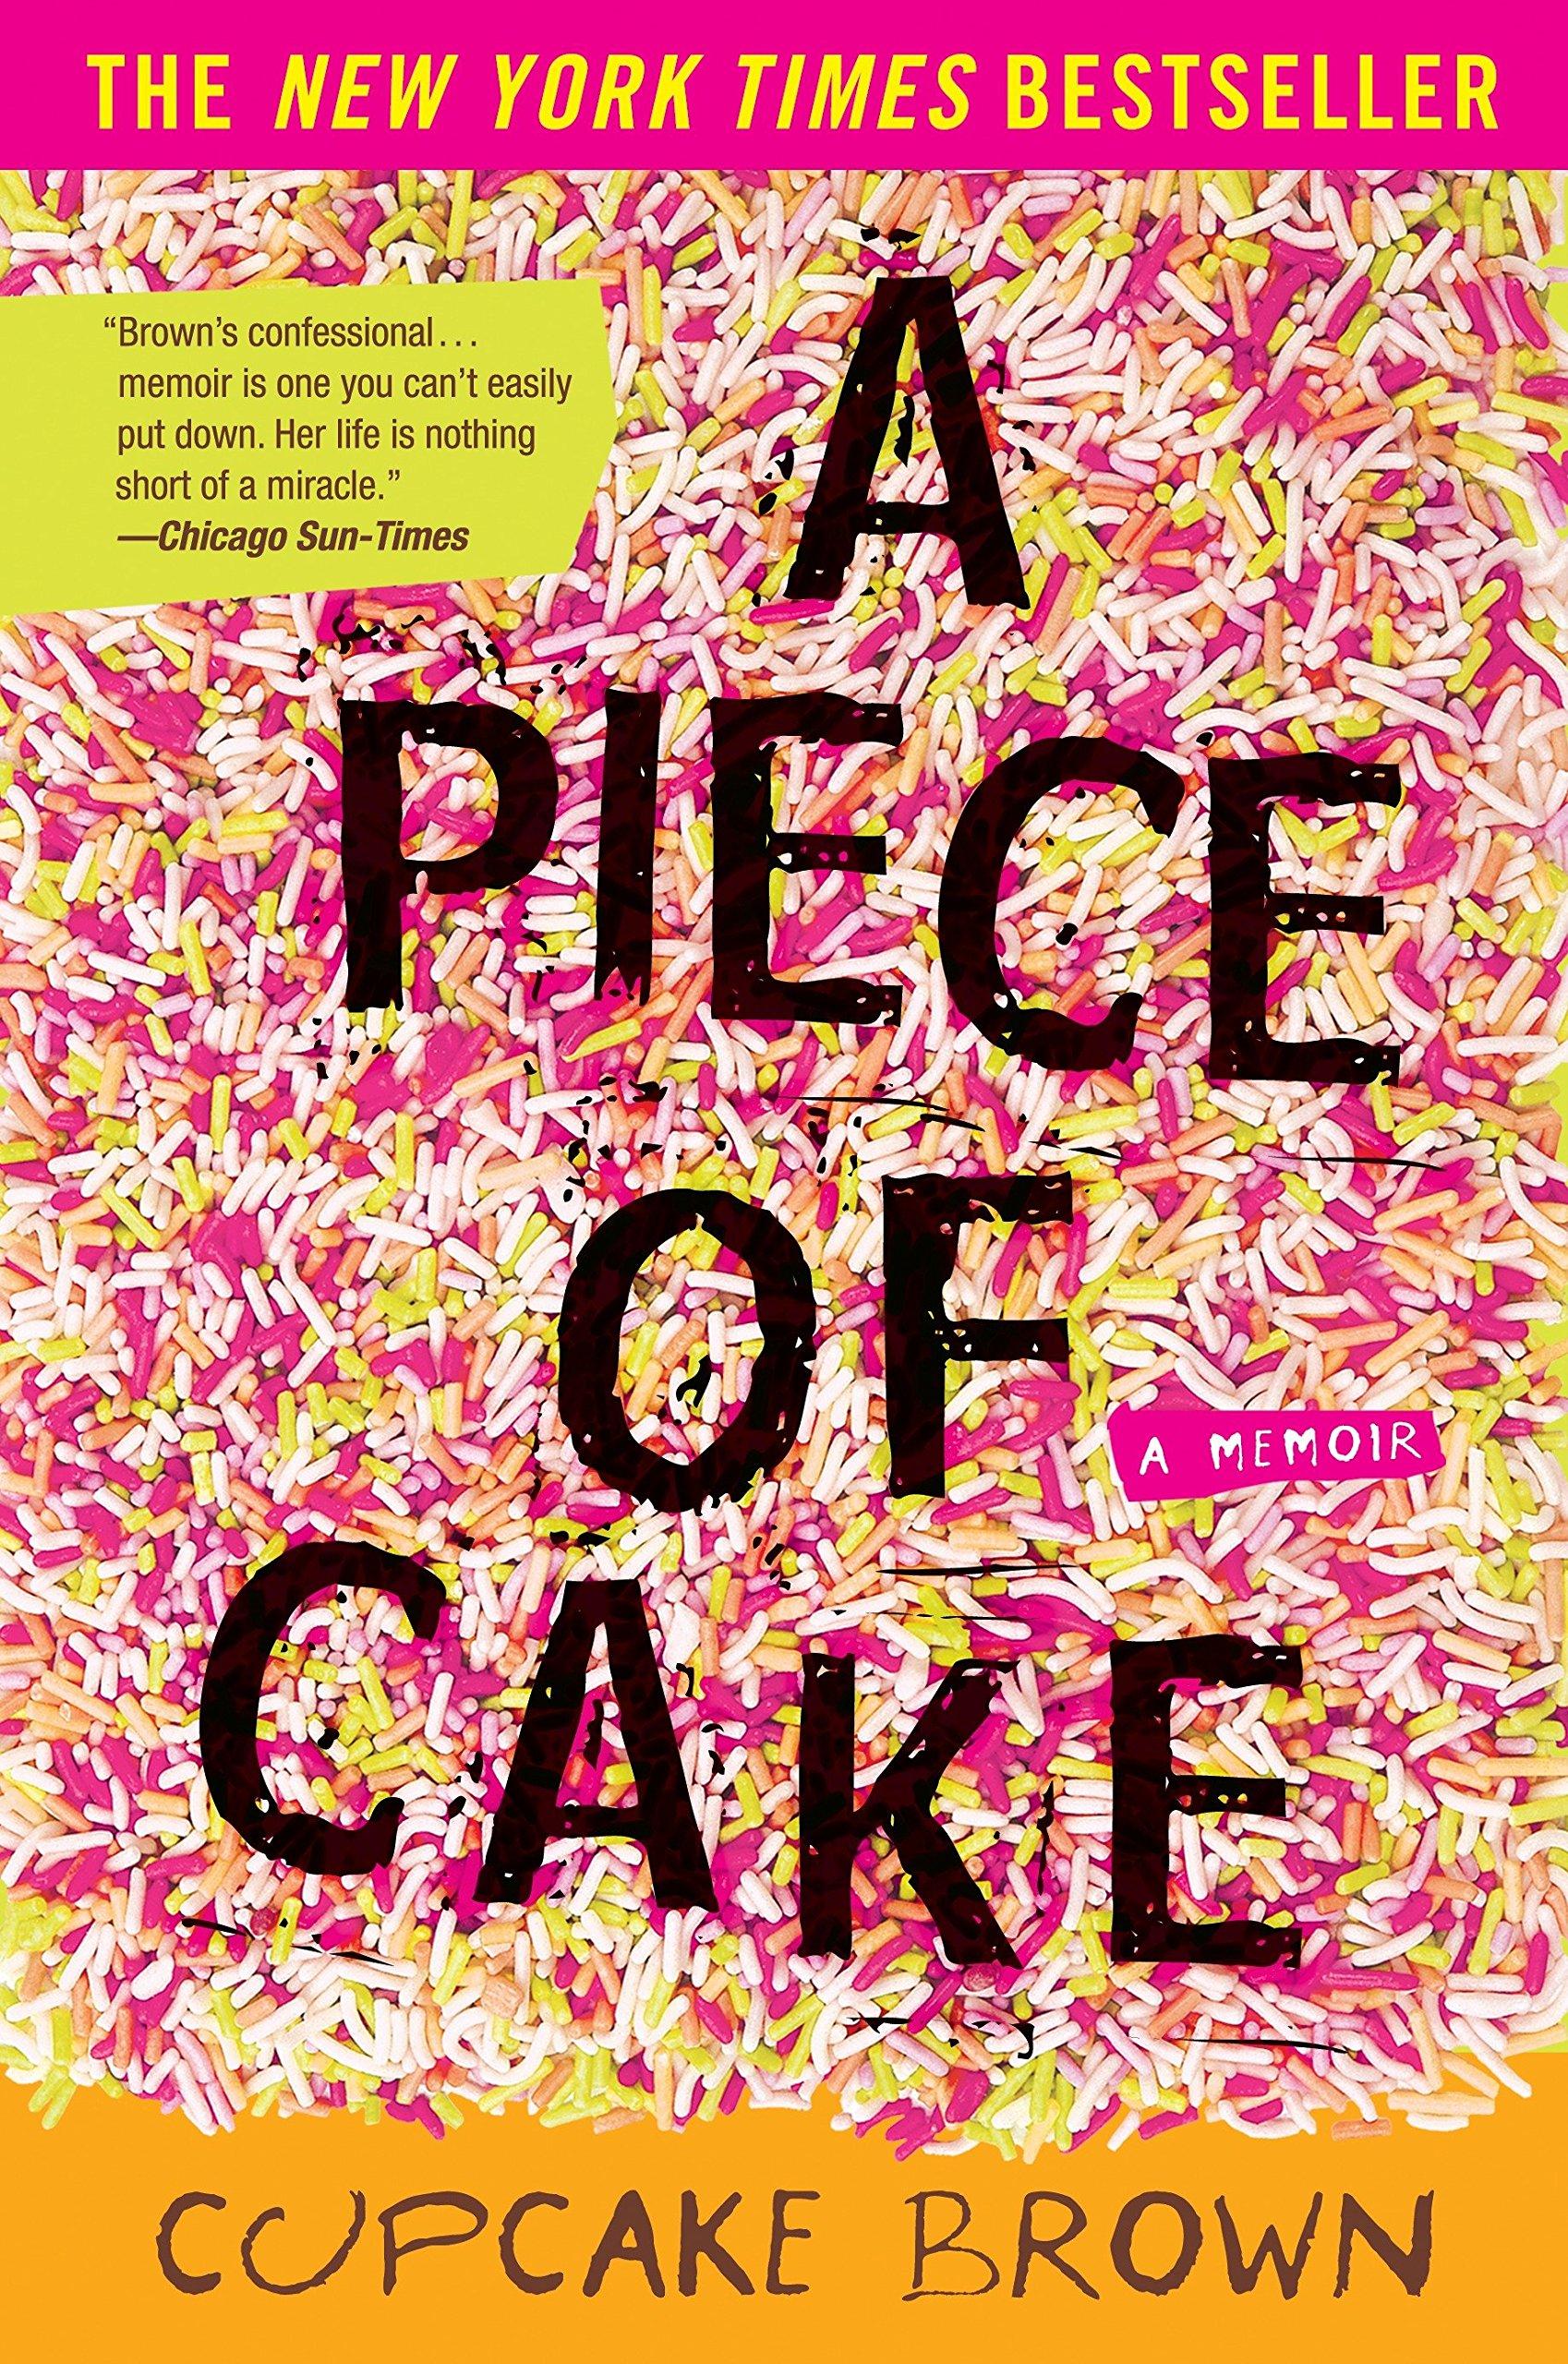 A Piece of Cake: A Memoir: Cupcake Brown: 9780110000022: Amazon.com: Books